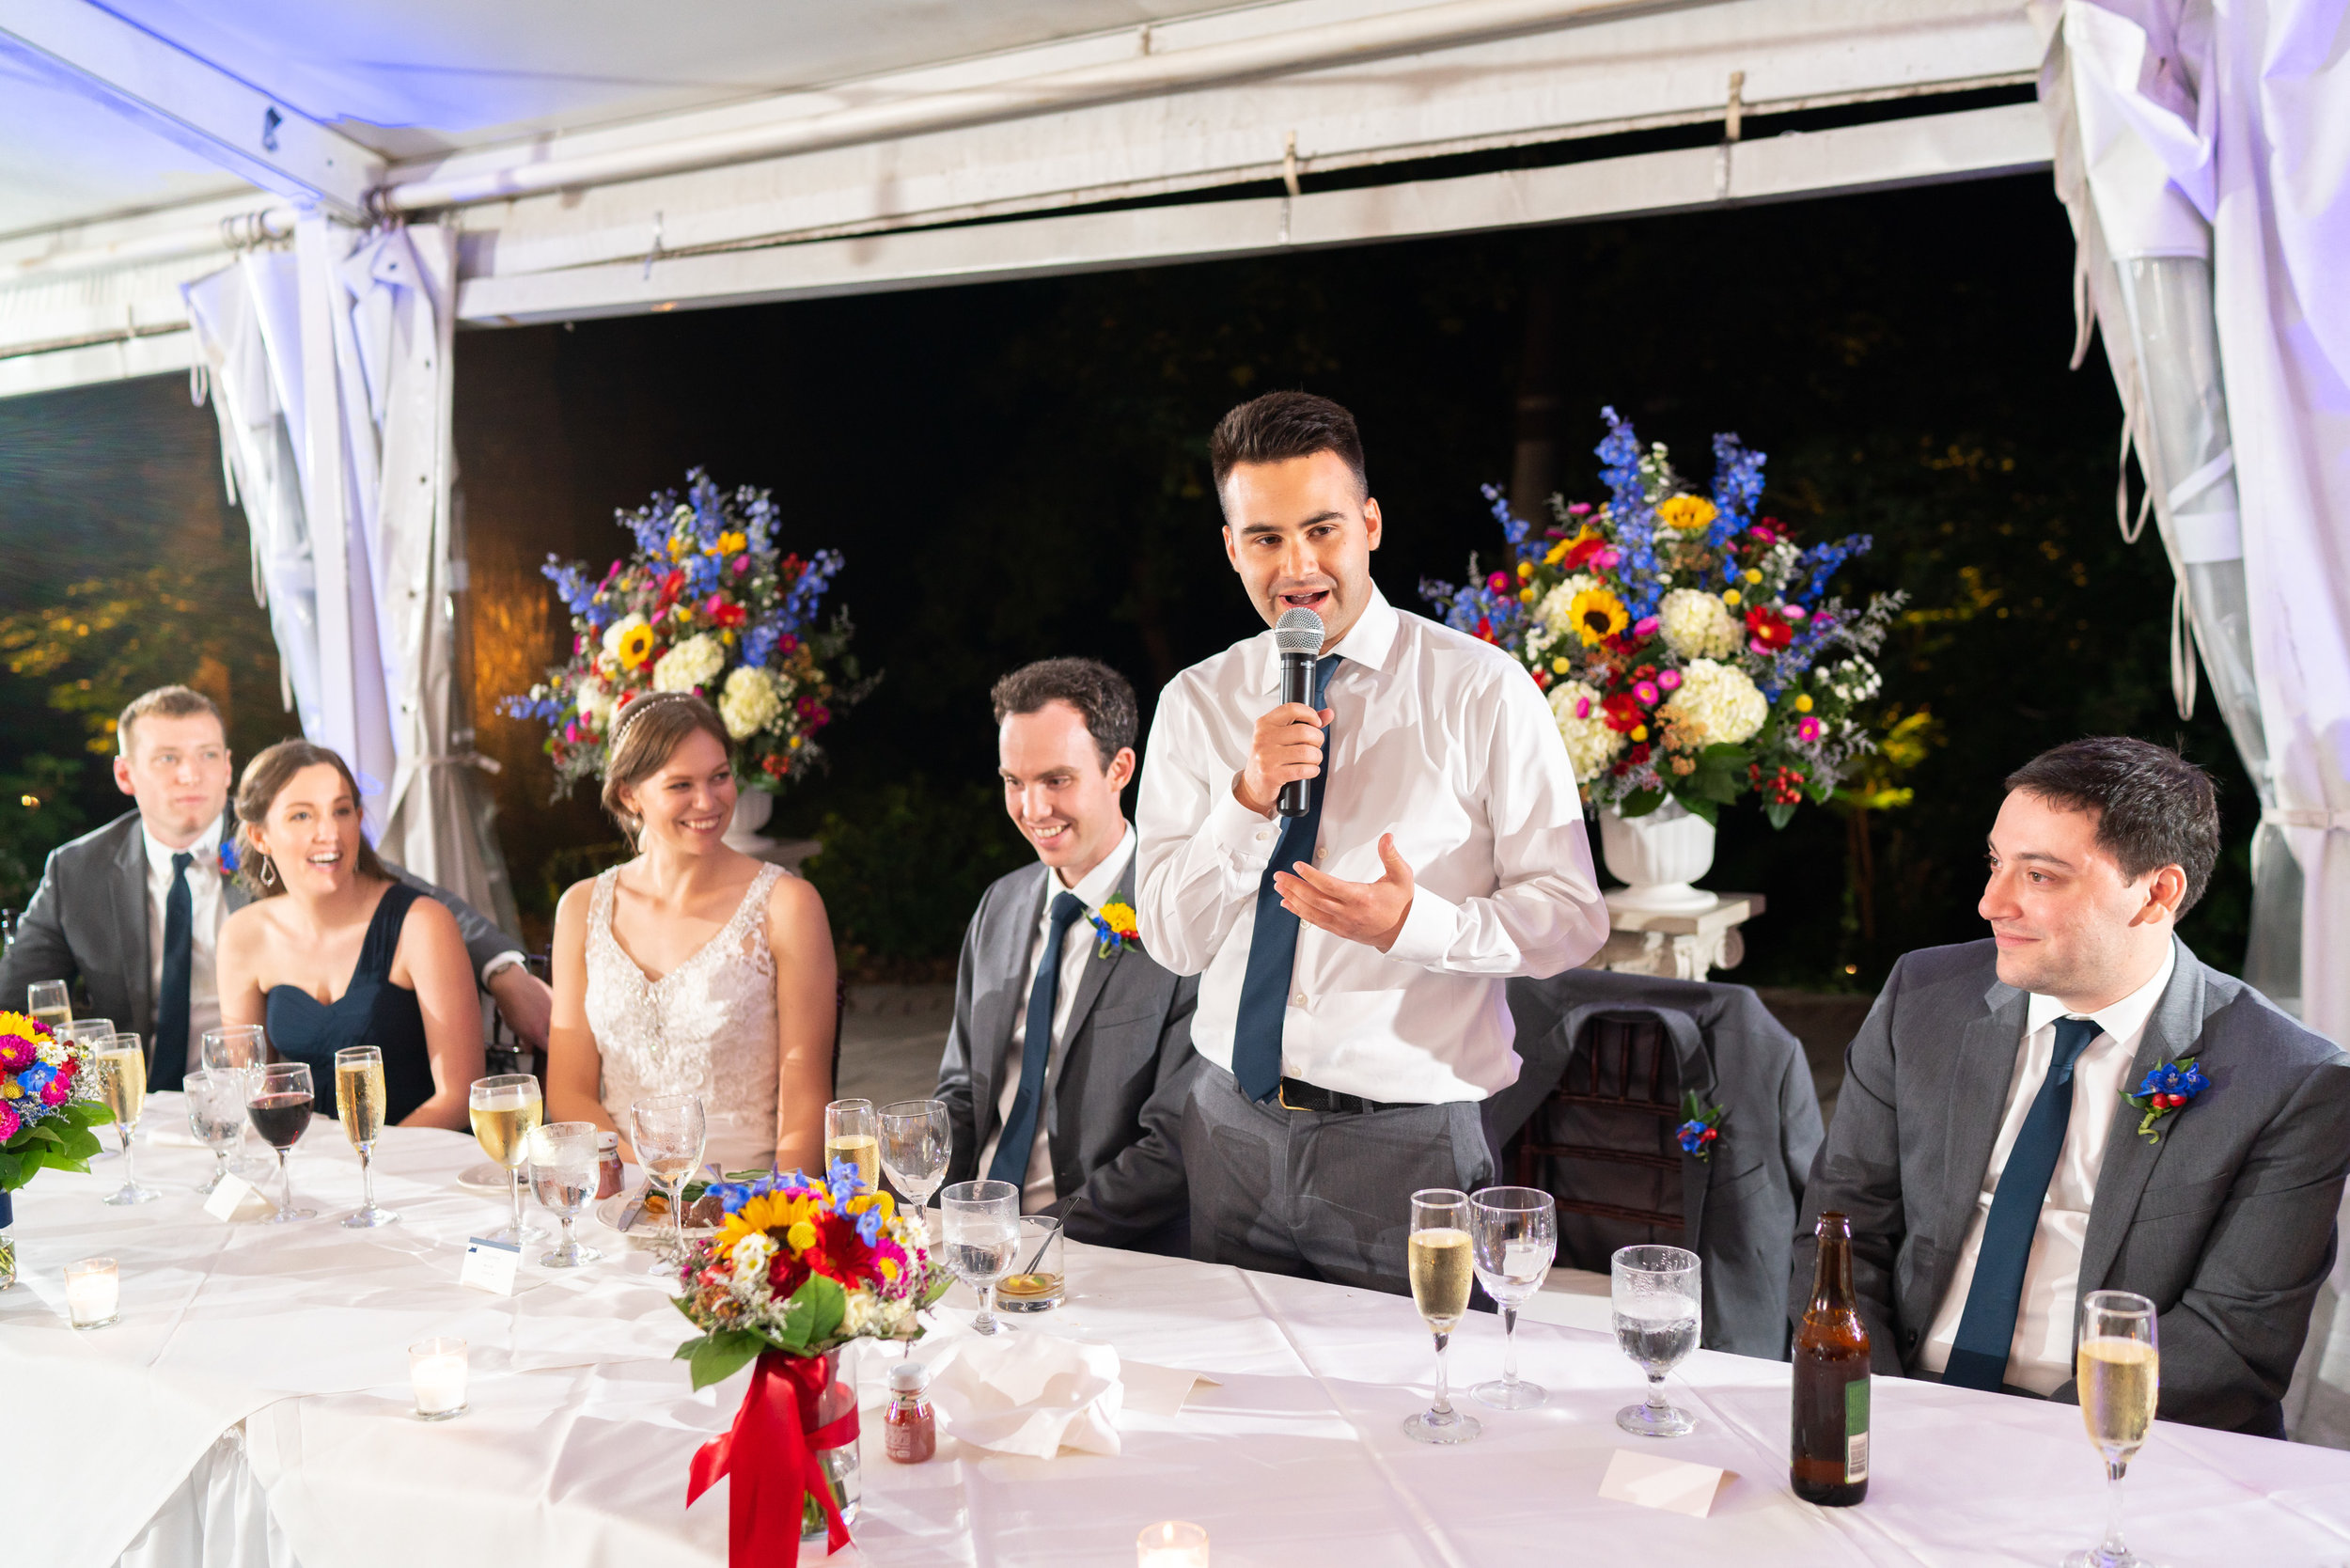 Toasts under a white tent at Elkridge Furnace Inn wedding reception photos